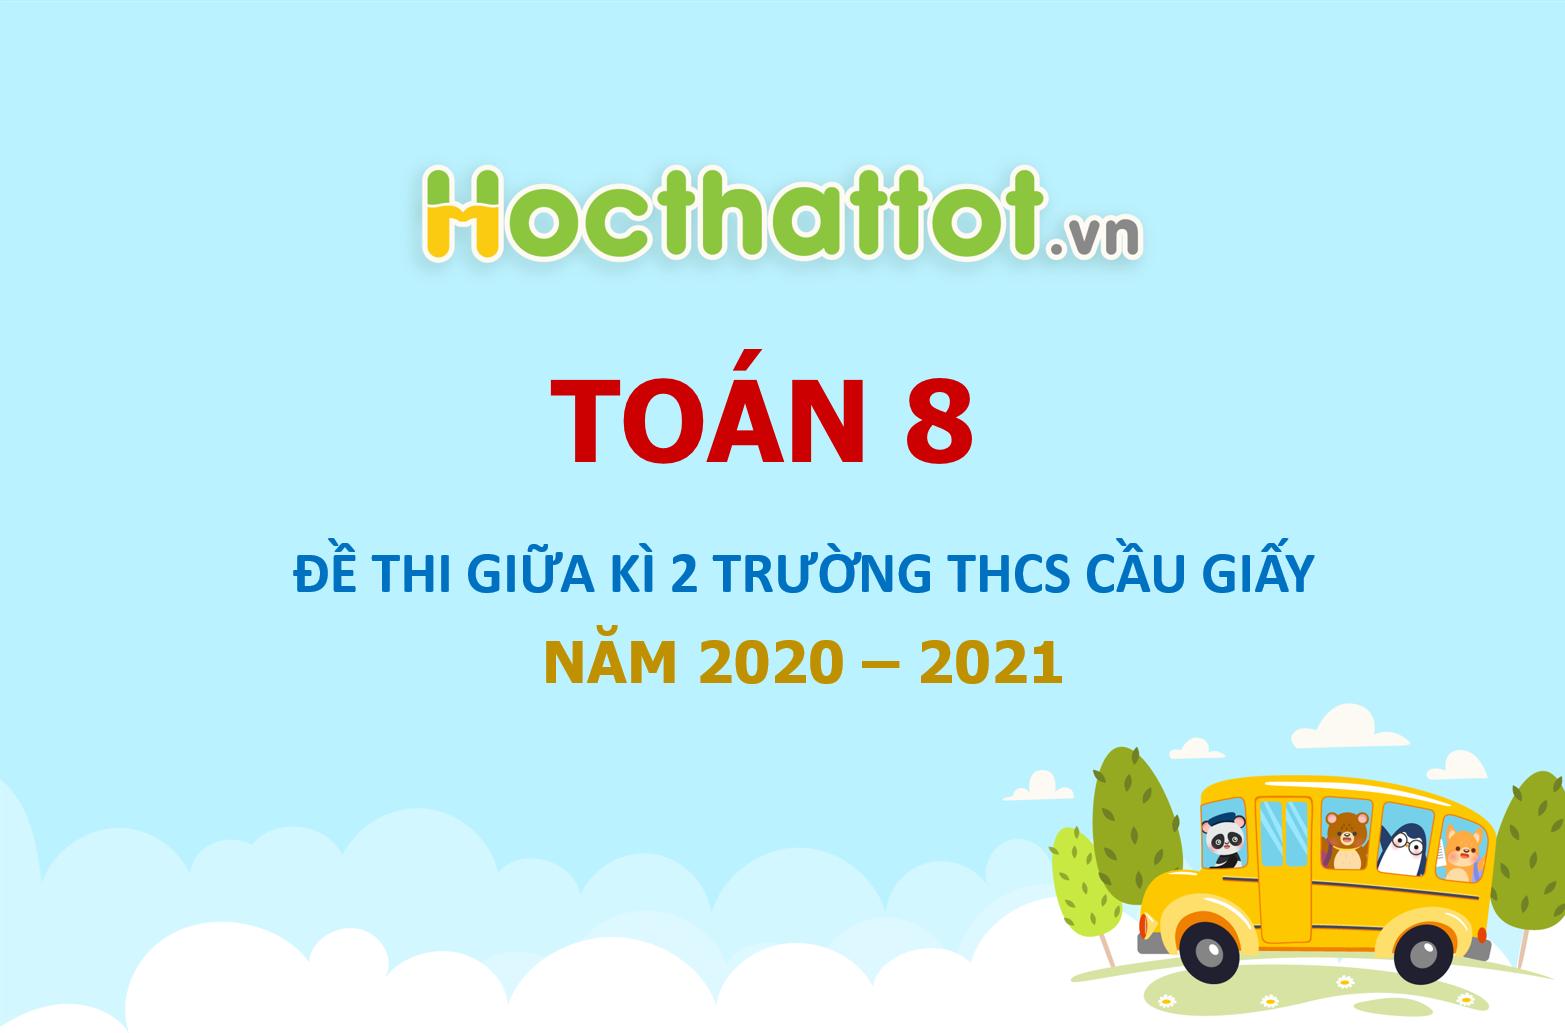 de-thi-giua-hoc-ky-2-toan-8-nam-2020-2021-truong-thcs-cau-giay-ha-noi